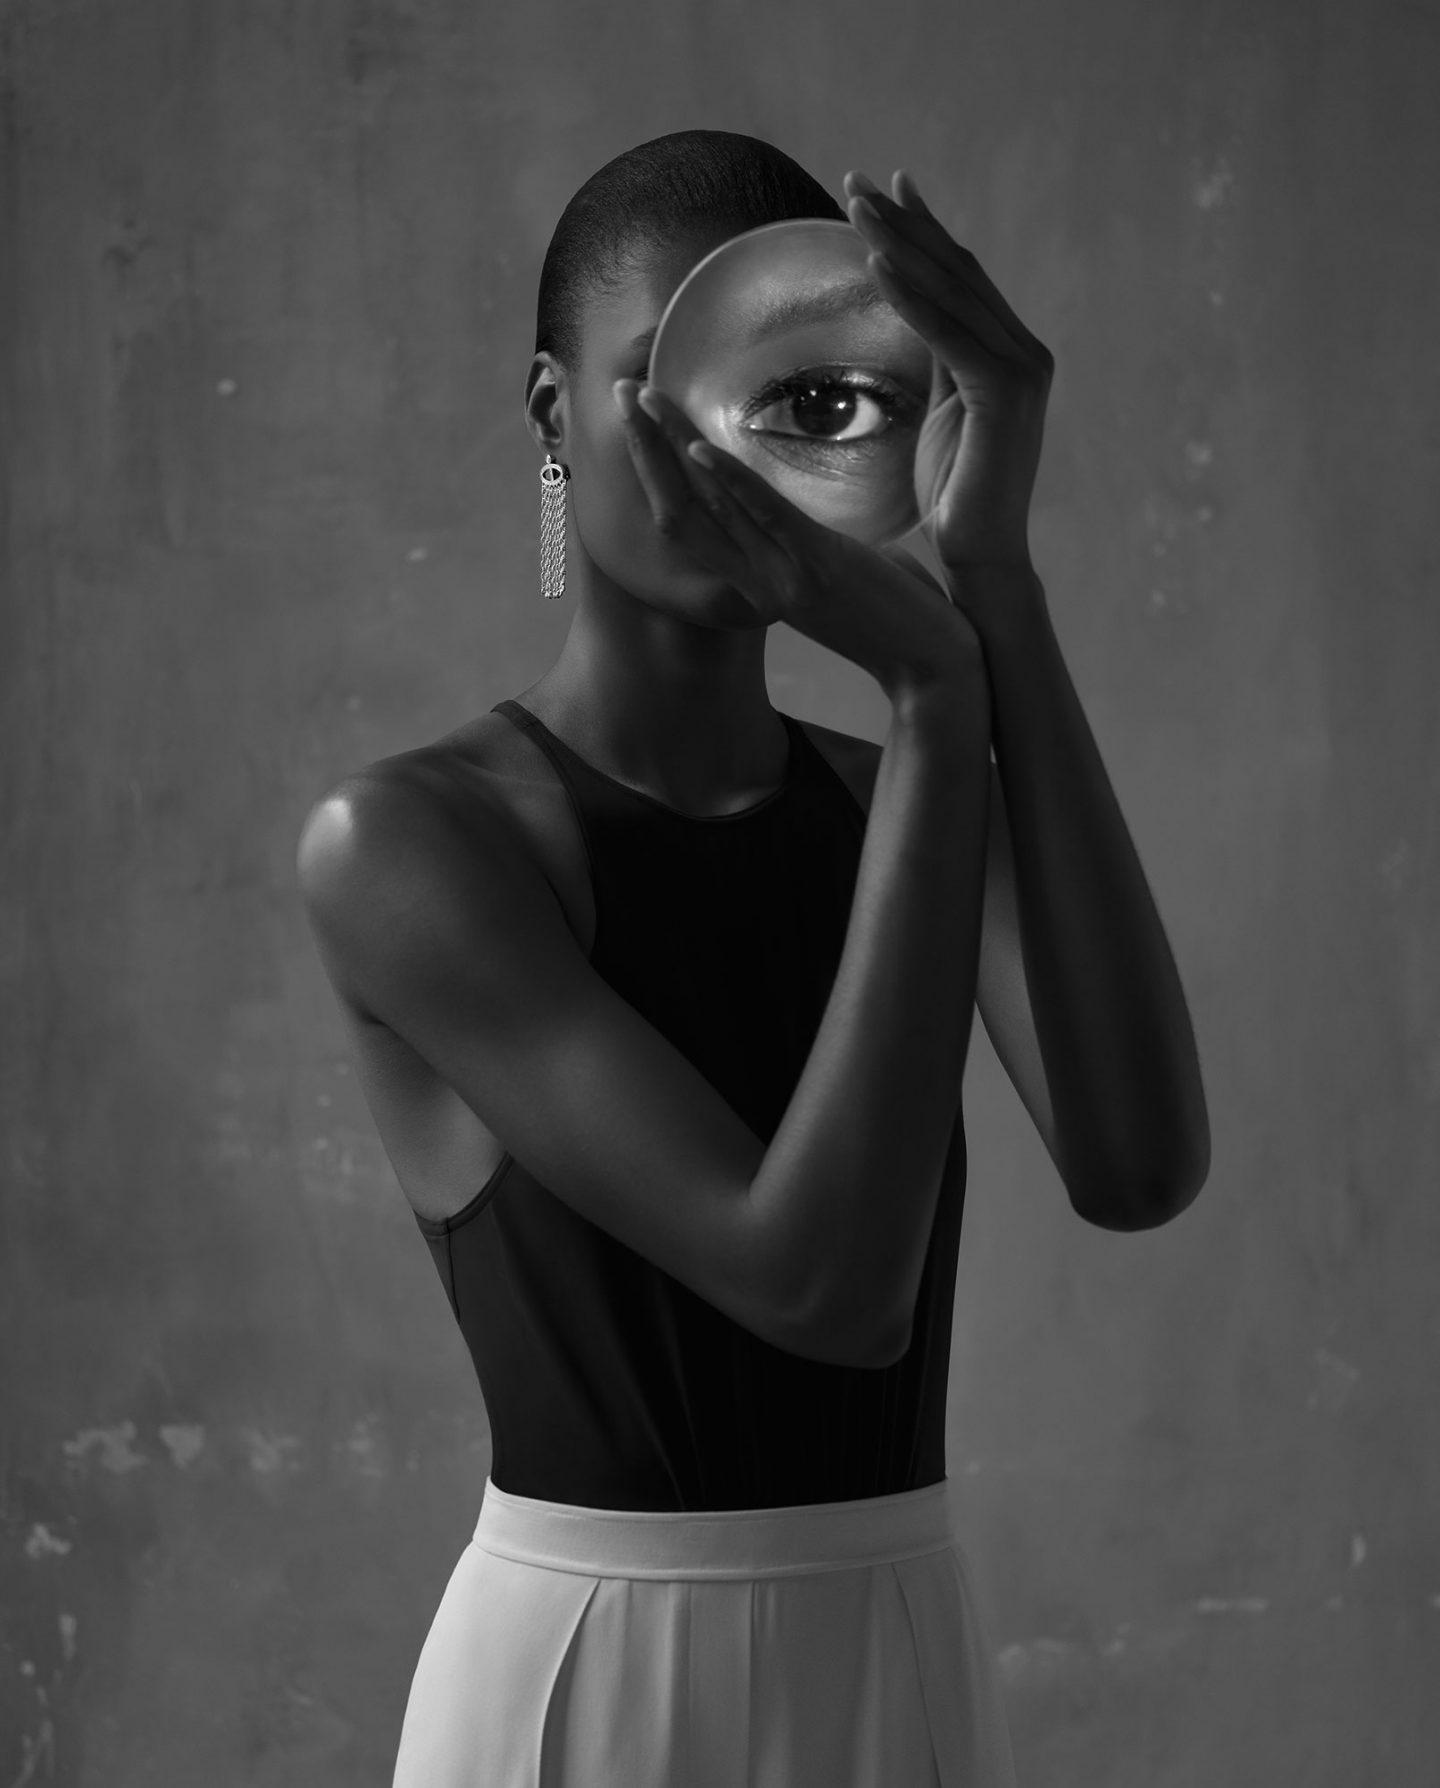 IGNANT-Photography-MarcusSchaefer-19